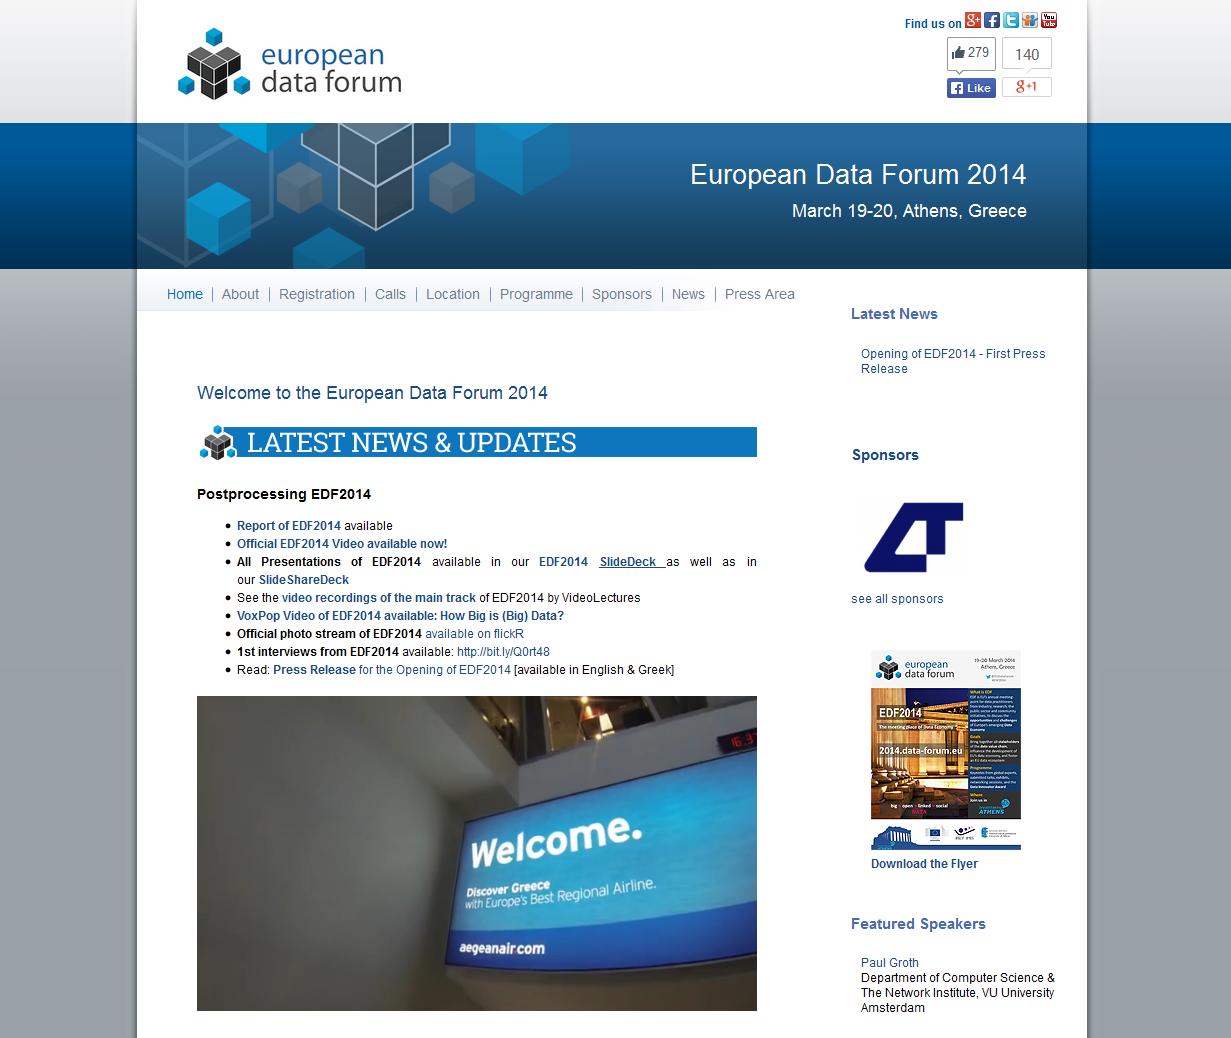 EDF 2014 - European Data Forum 2014